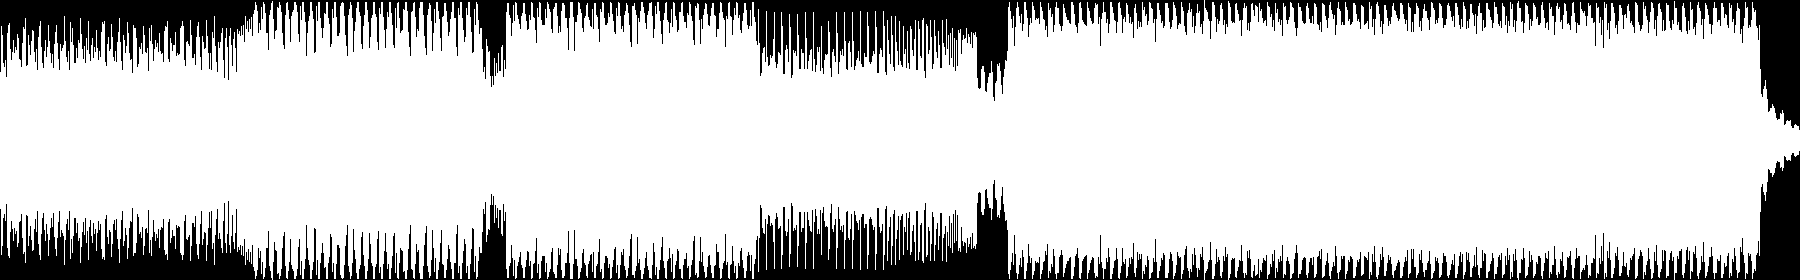 Neon Techno audio waveform